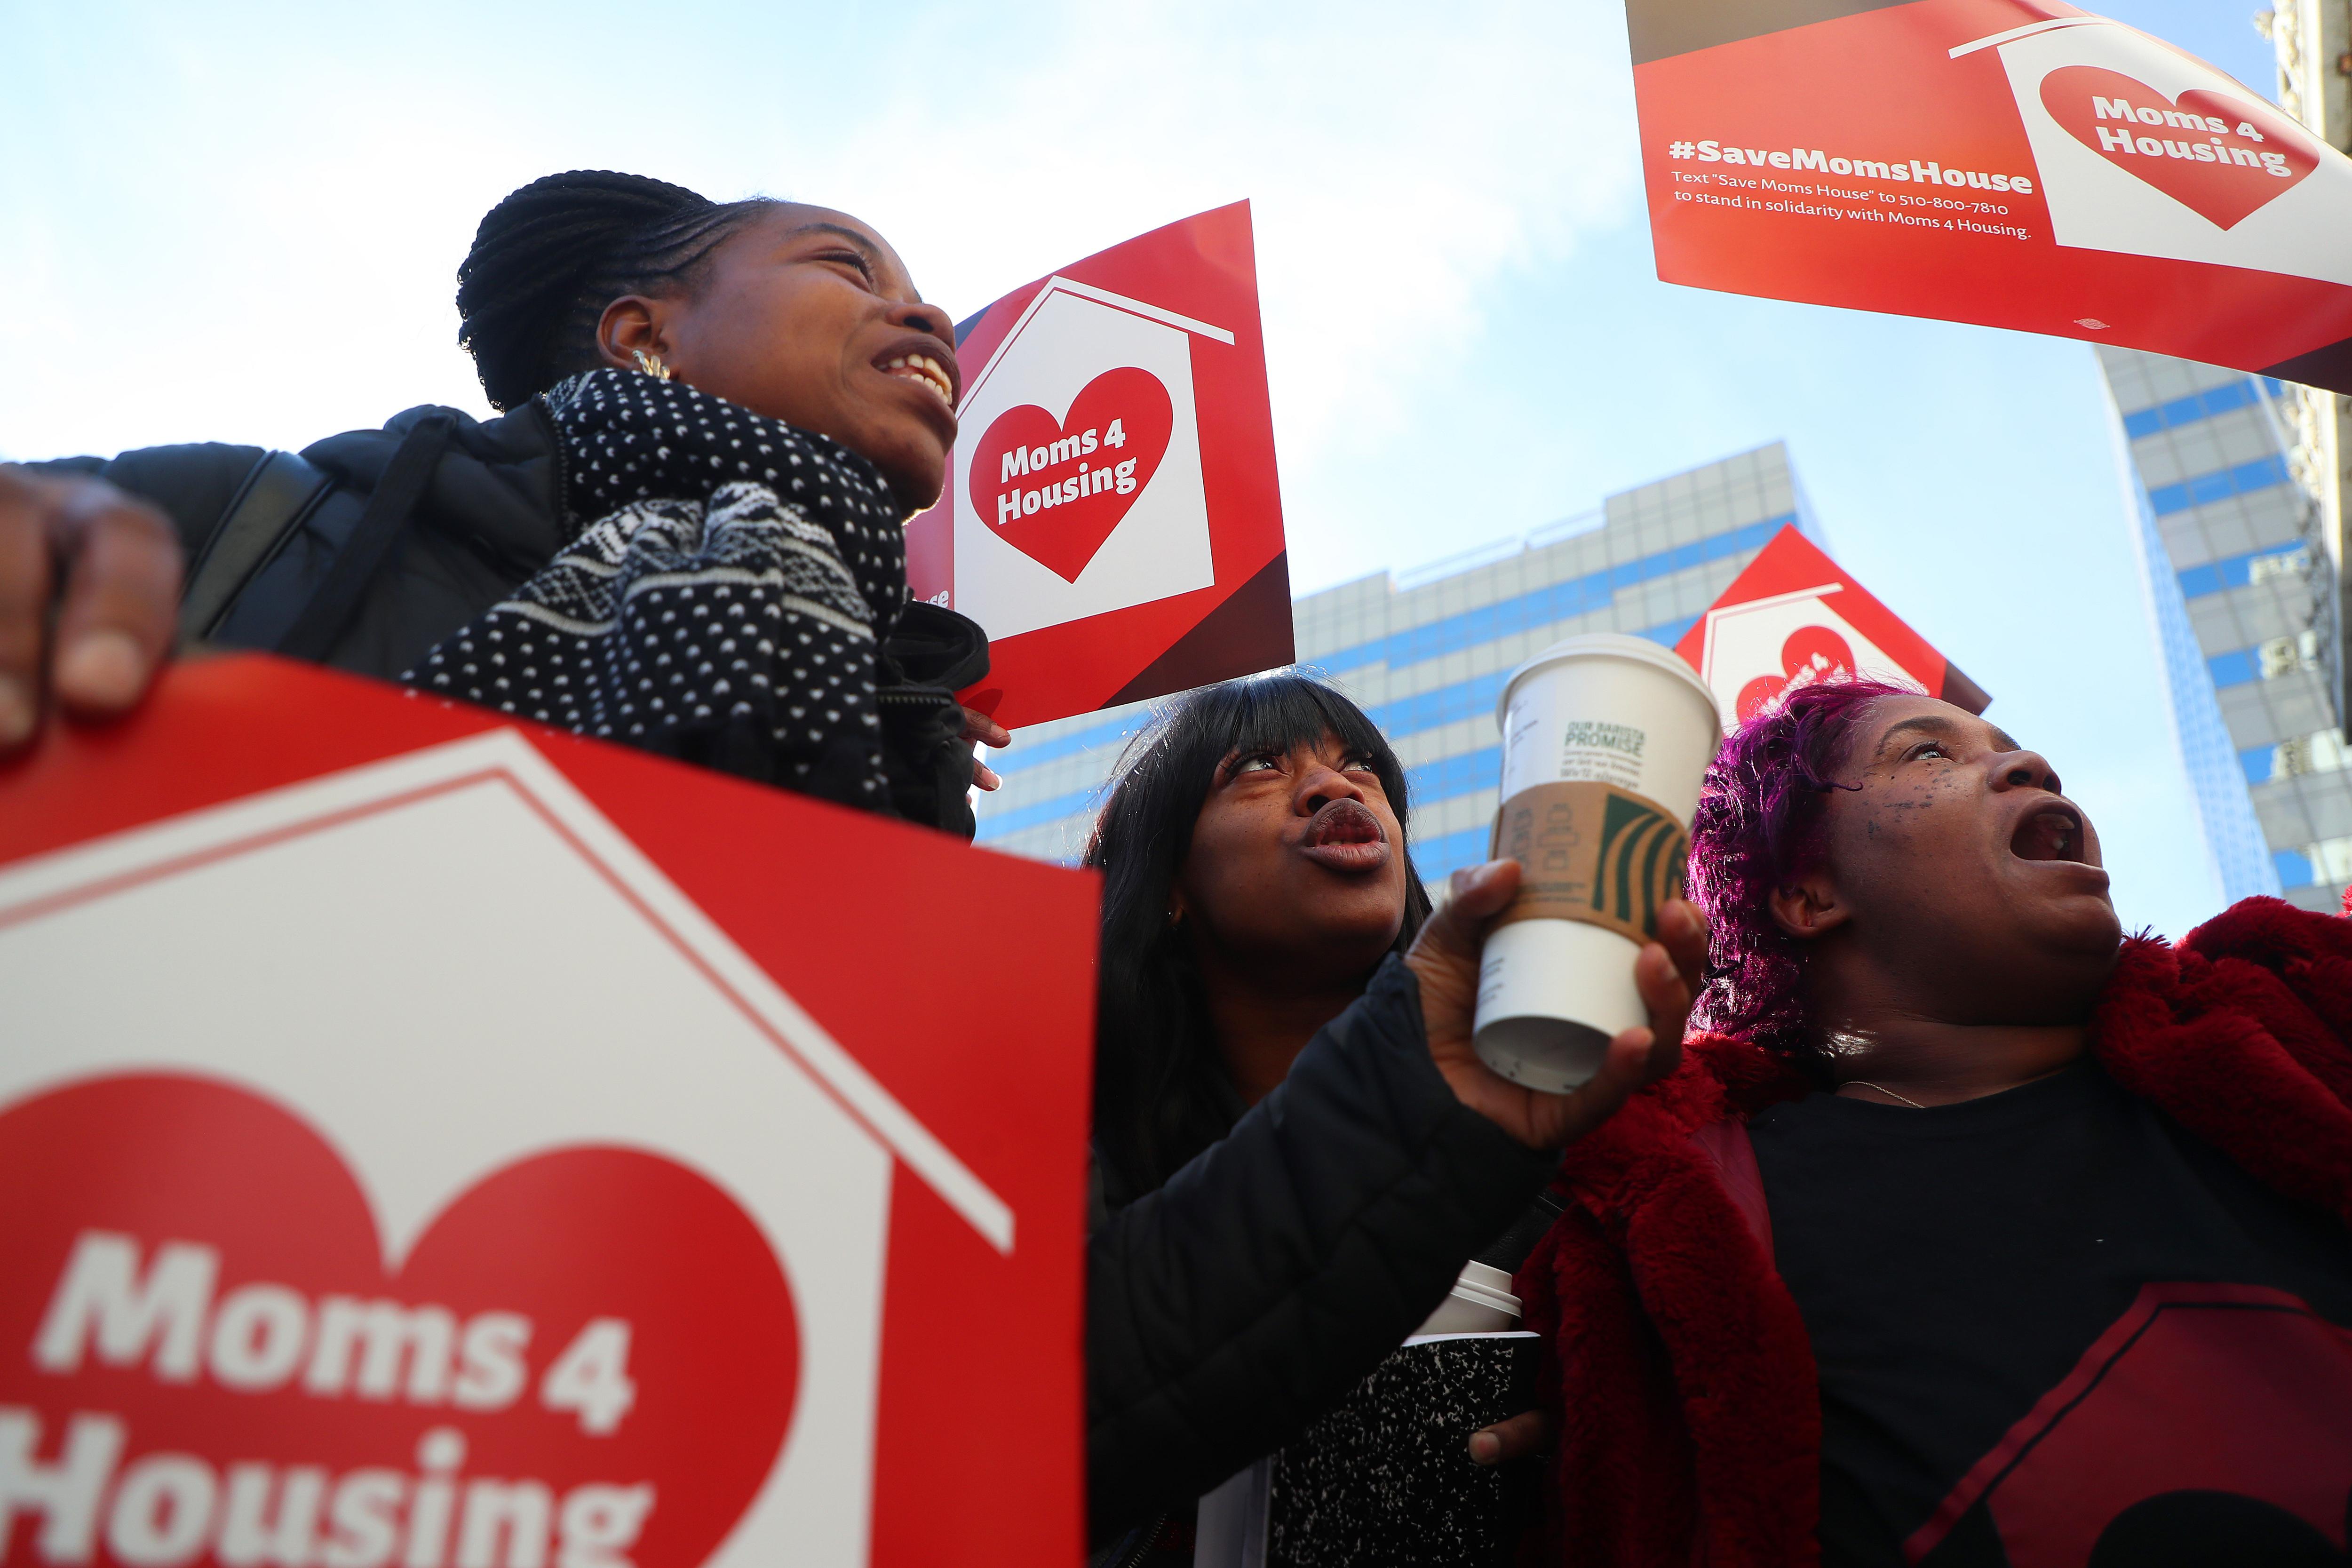 Protestors in Oakland advancing housing justice legislation.